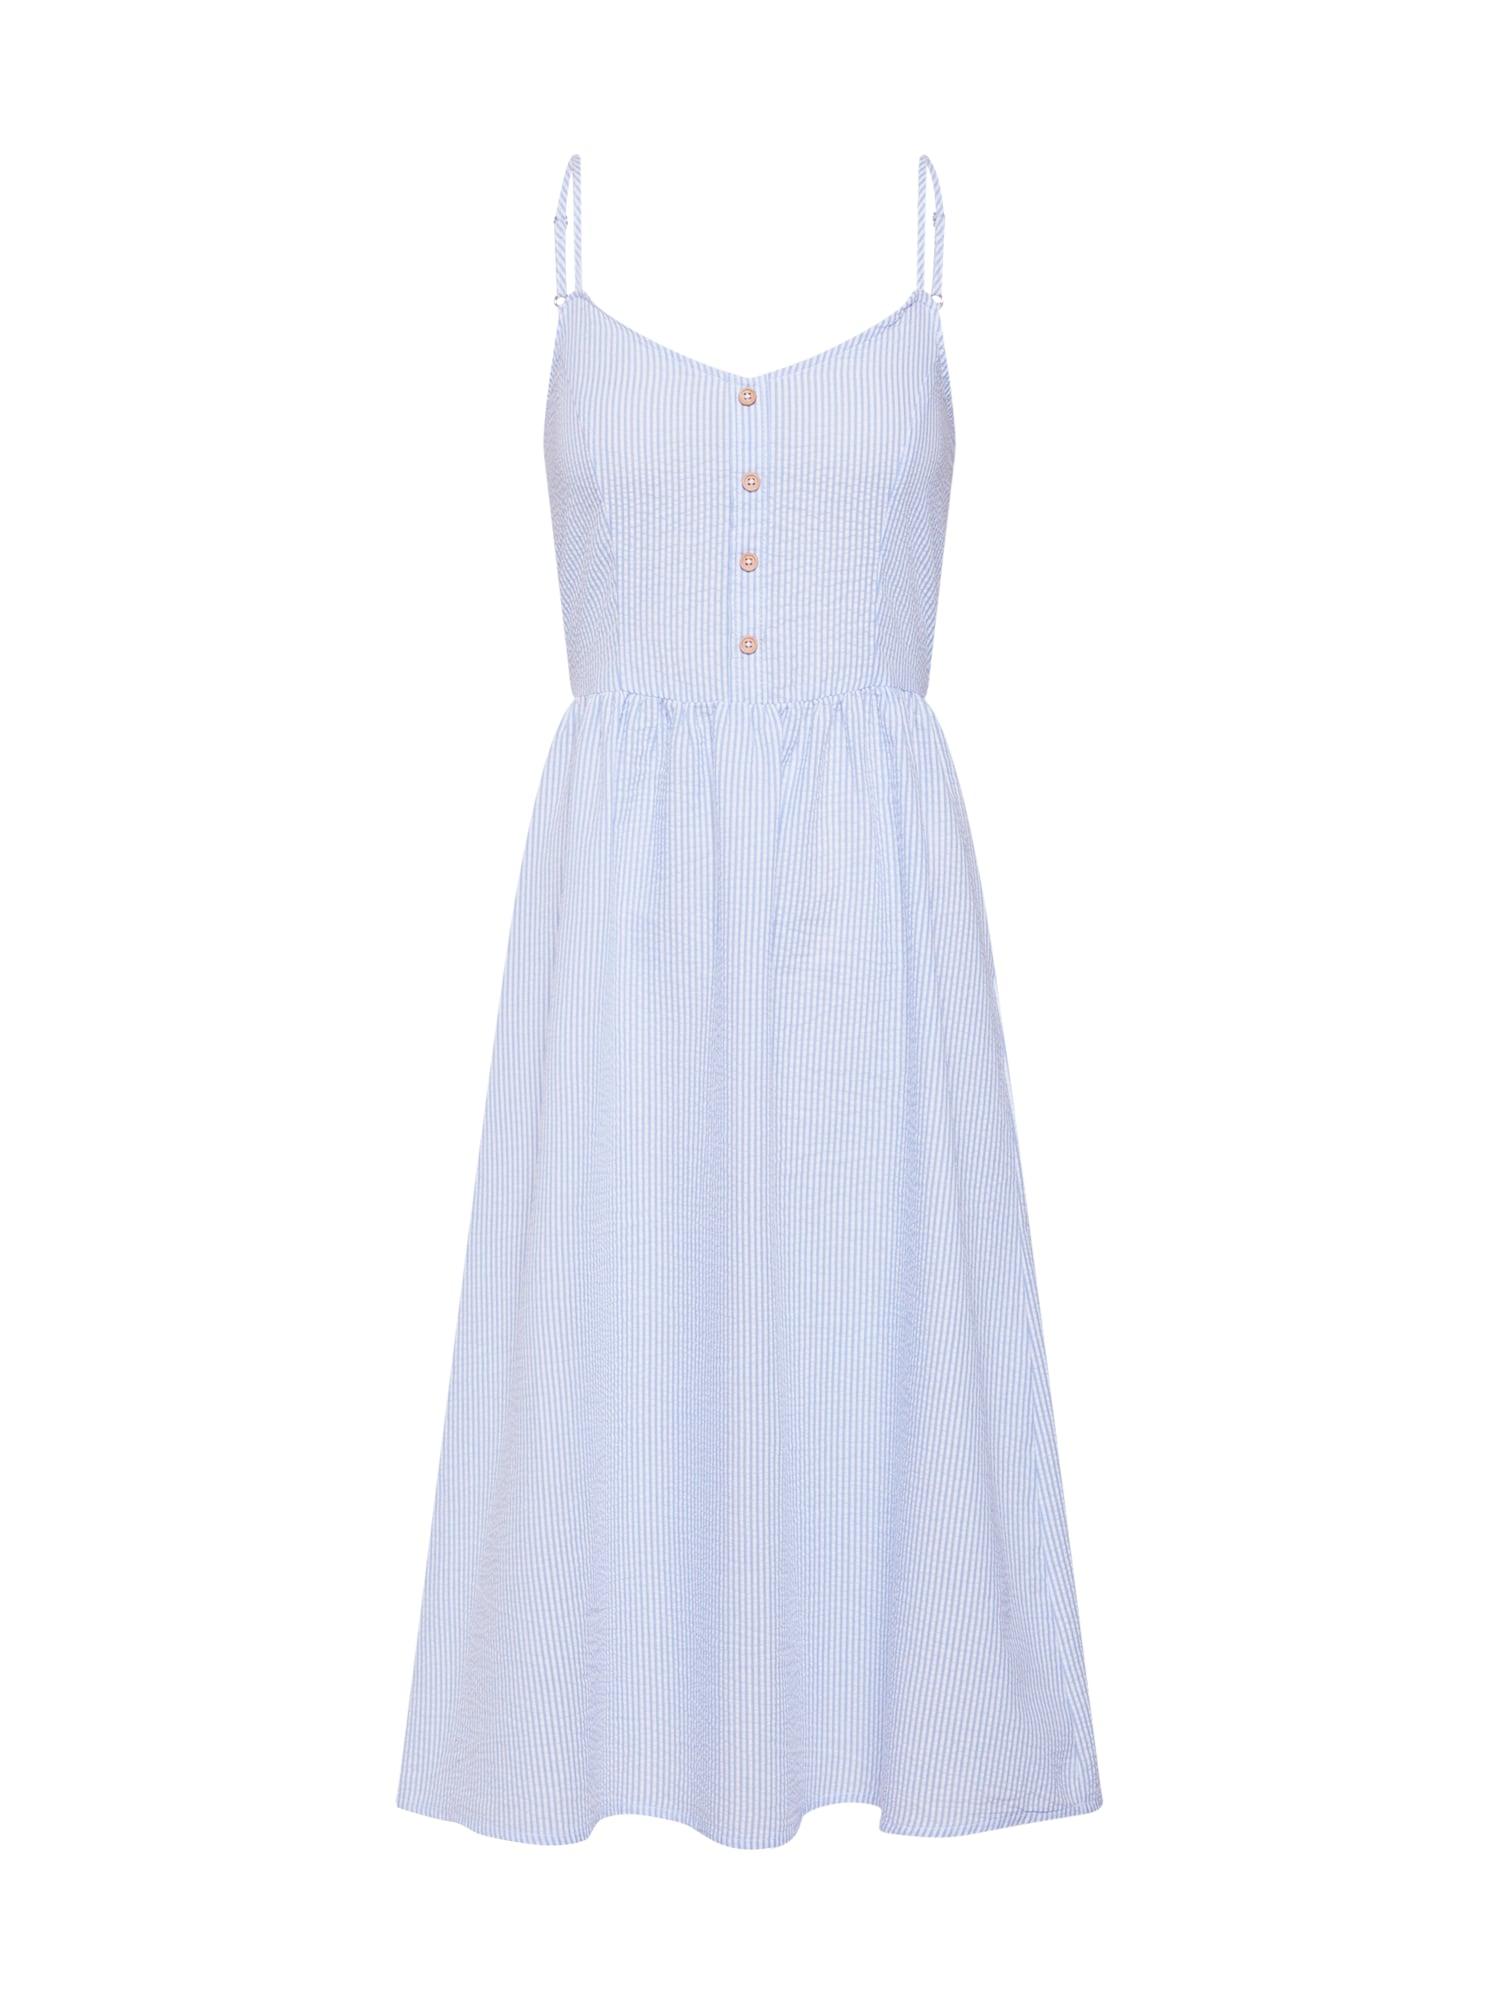 Letní šaty JDYKARIM světlemodrá bílá JACQUELINE De YONG